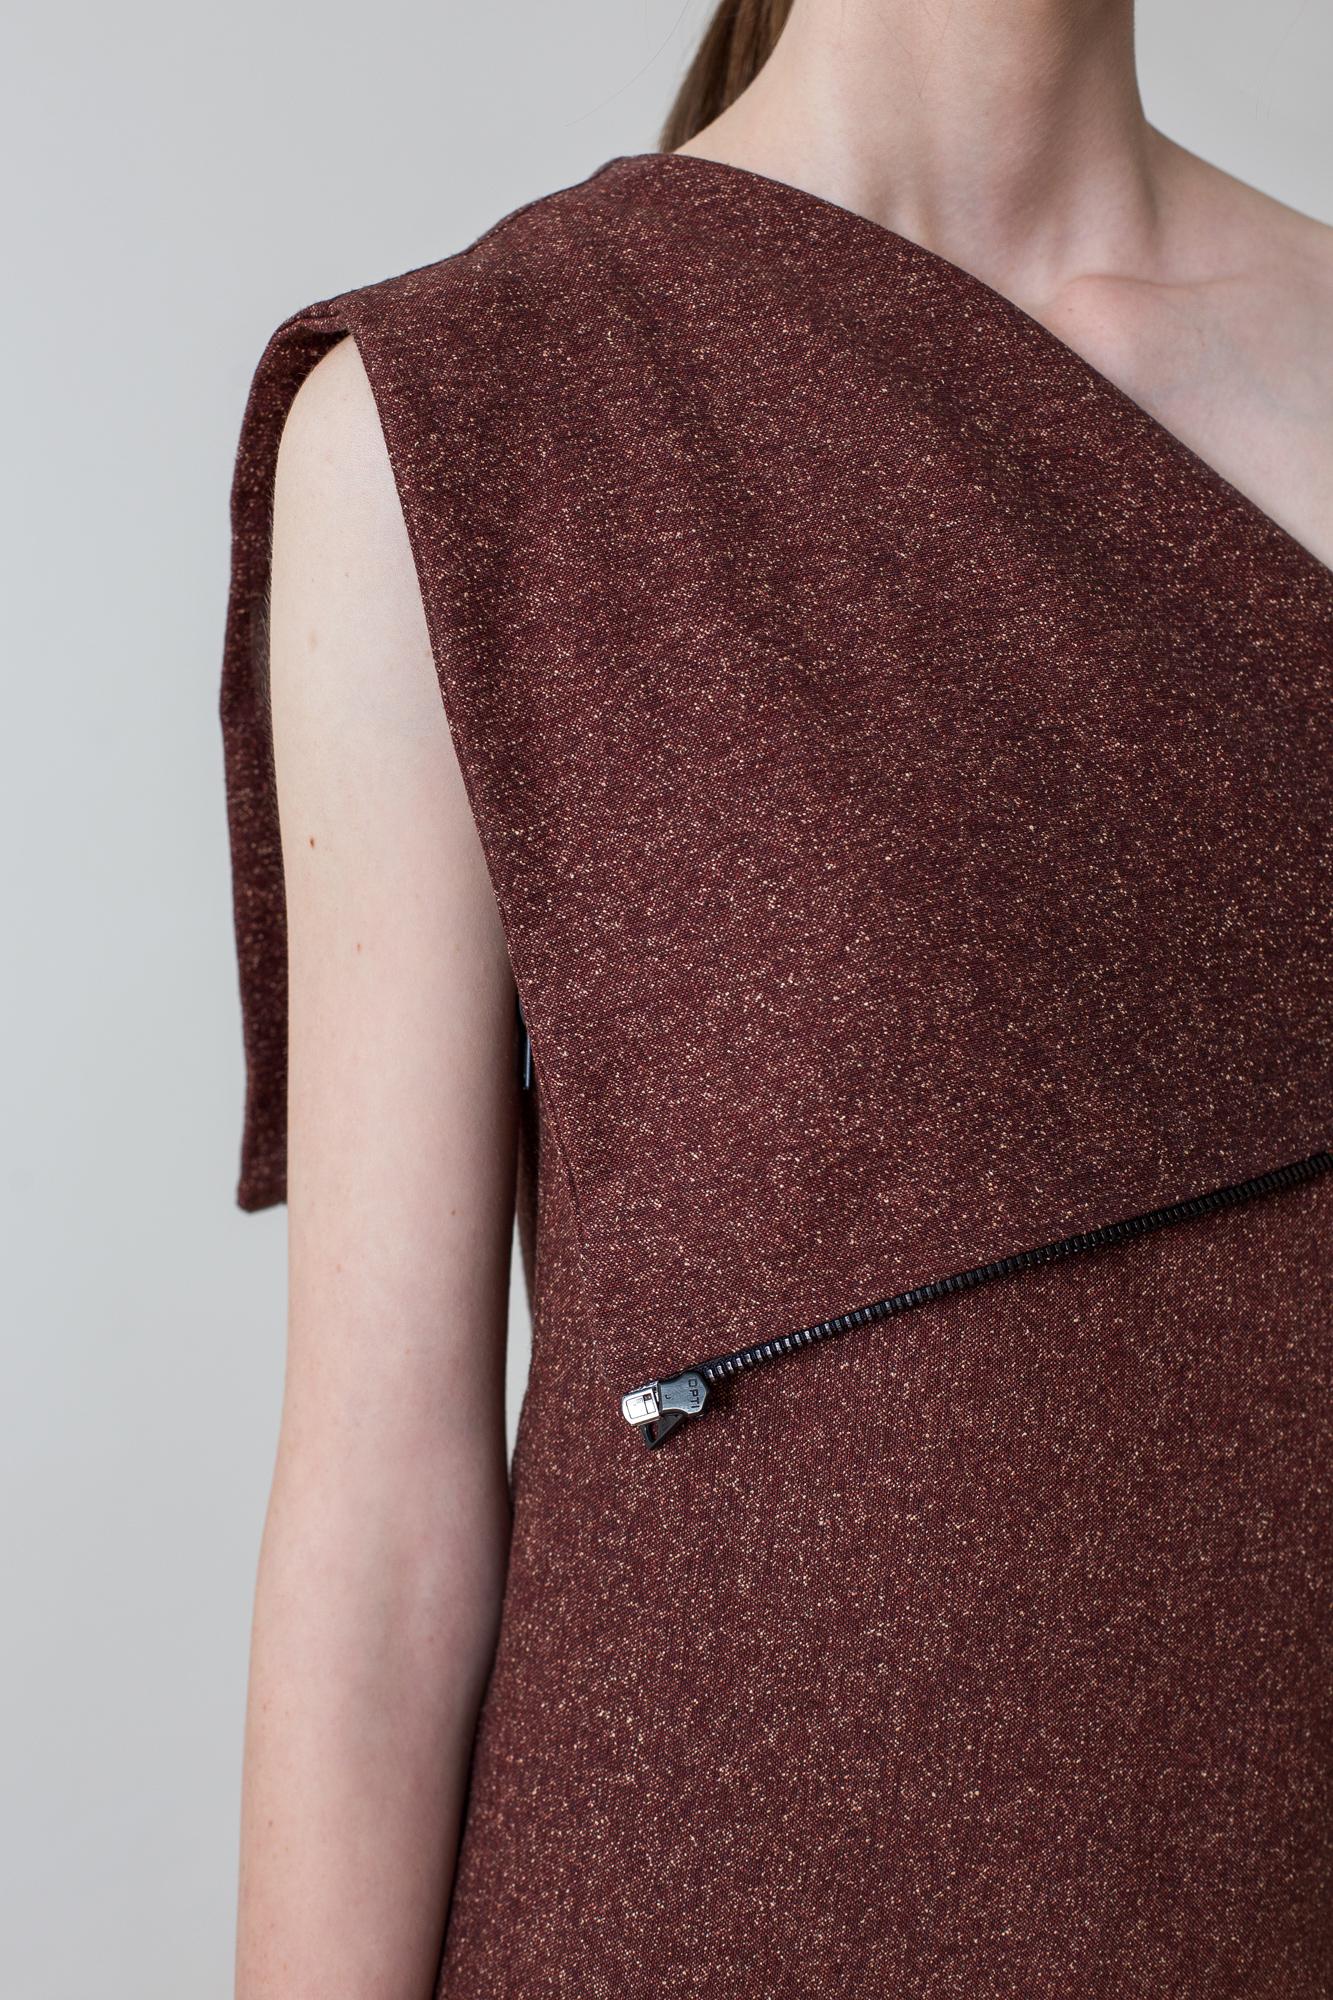 wearenotsisters_wrns_echo-dress_04